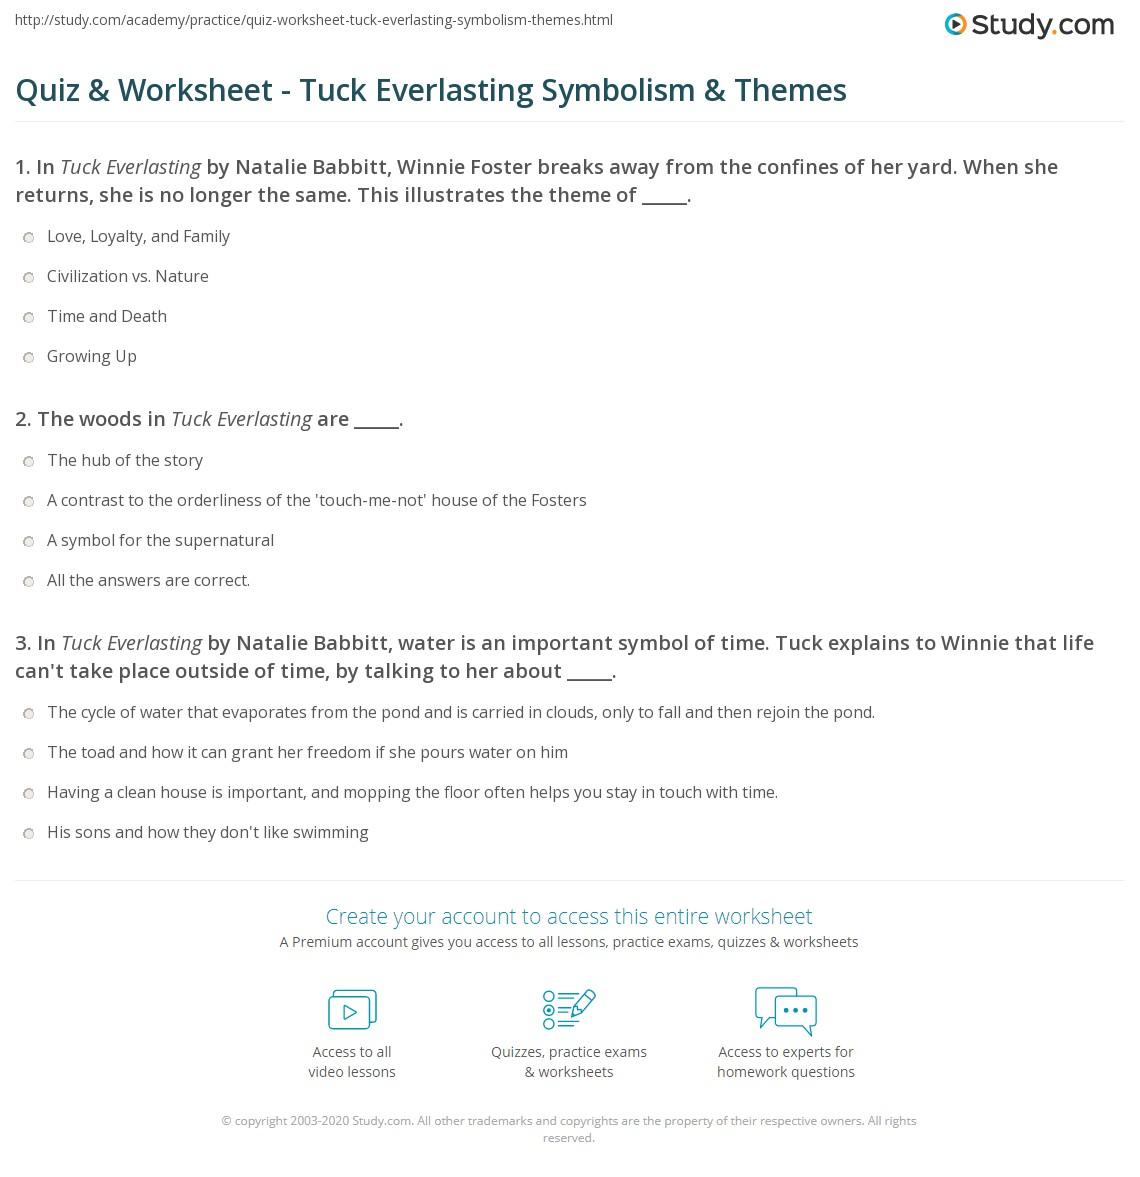 Quiz worksheet tuck everlasting symbolism themes study print tuck everlasting symbolism themes worksheet robcynllc Choice Image